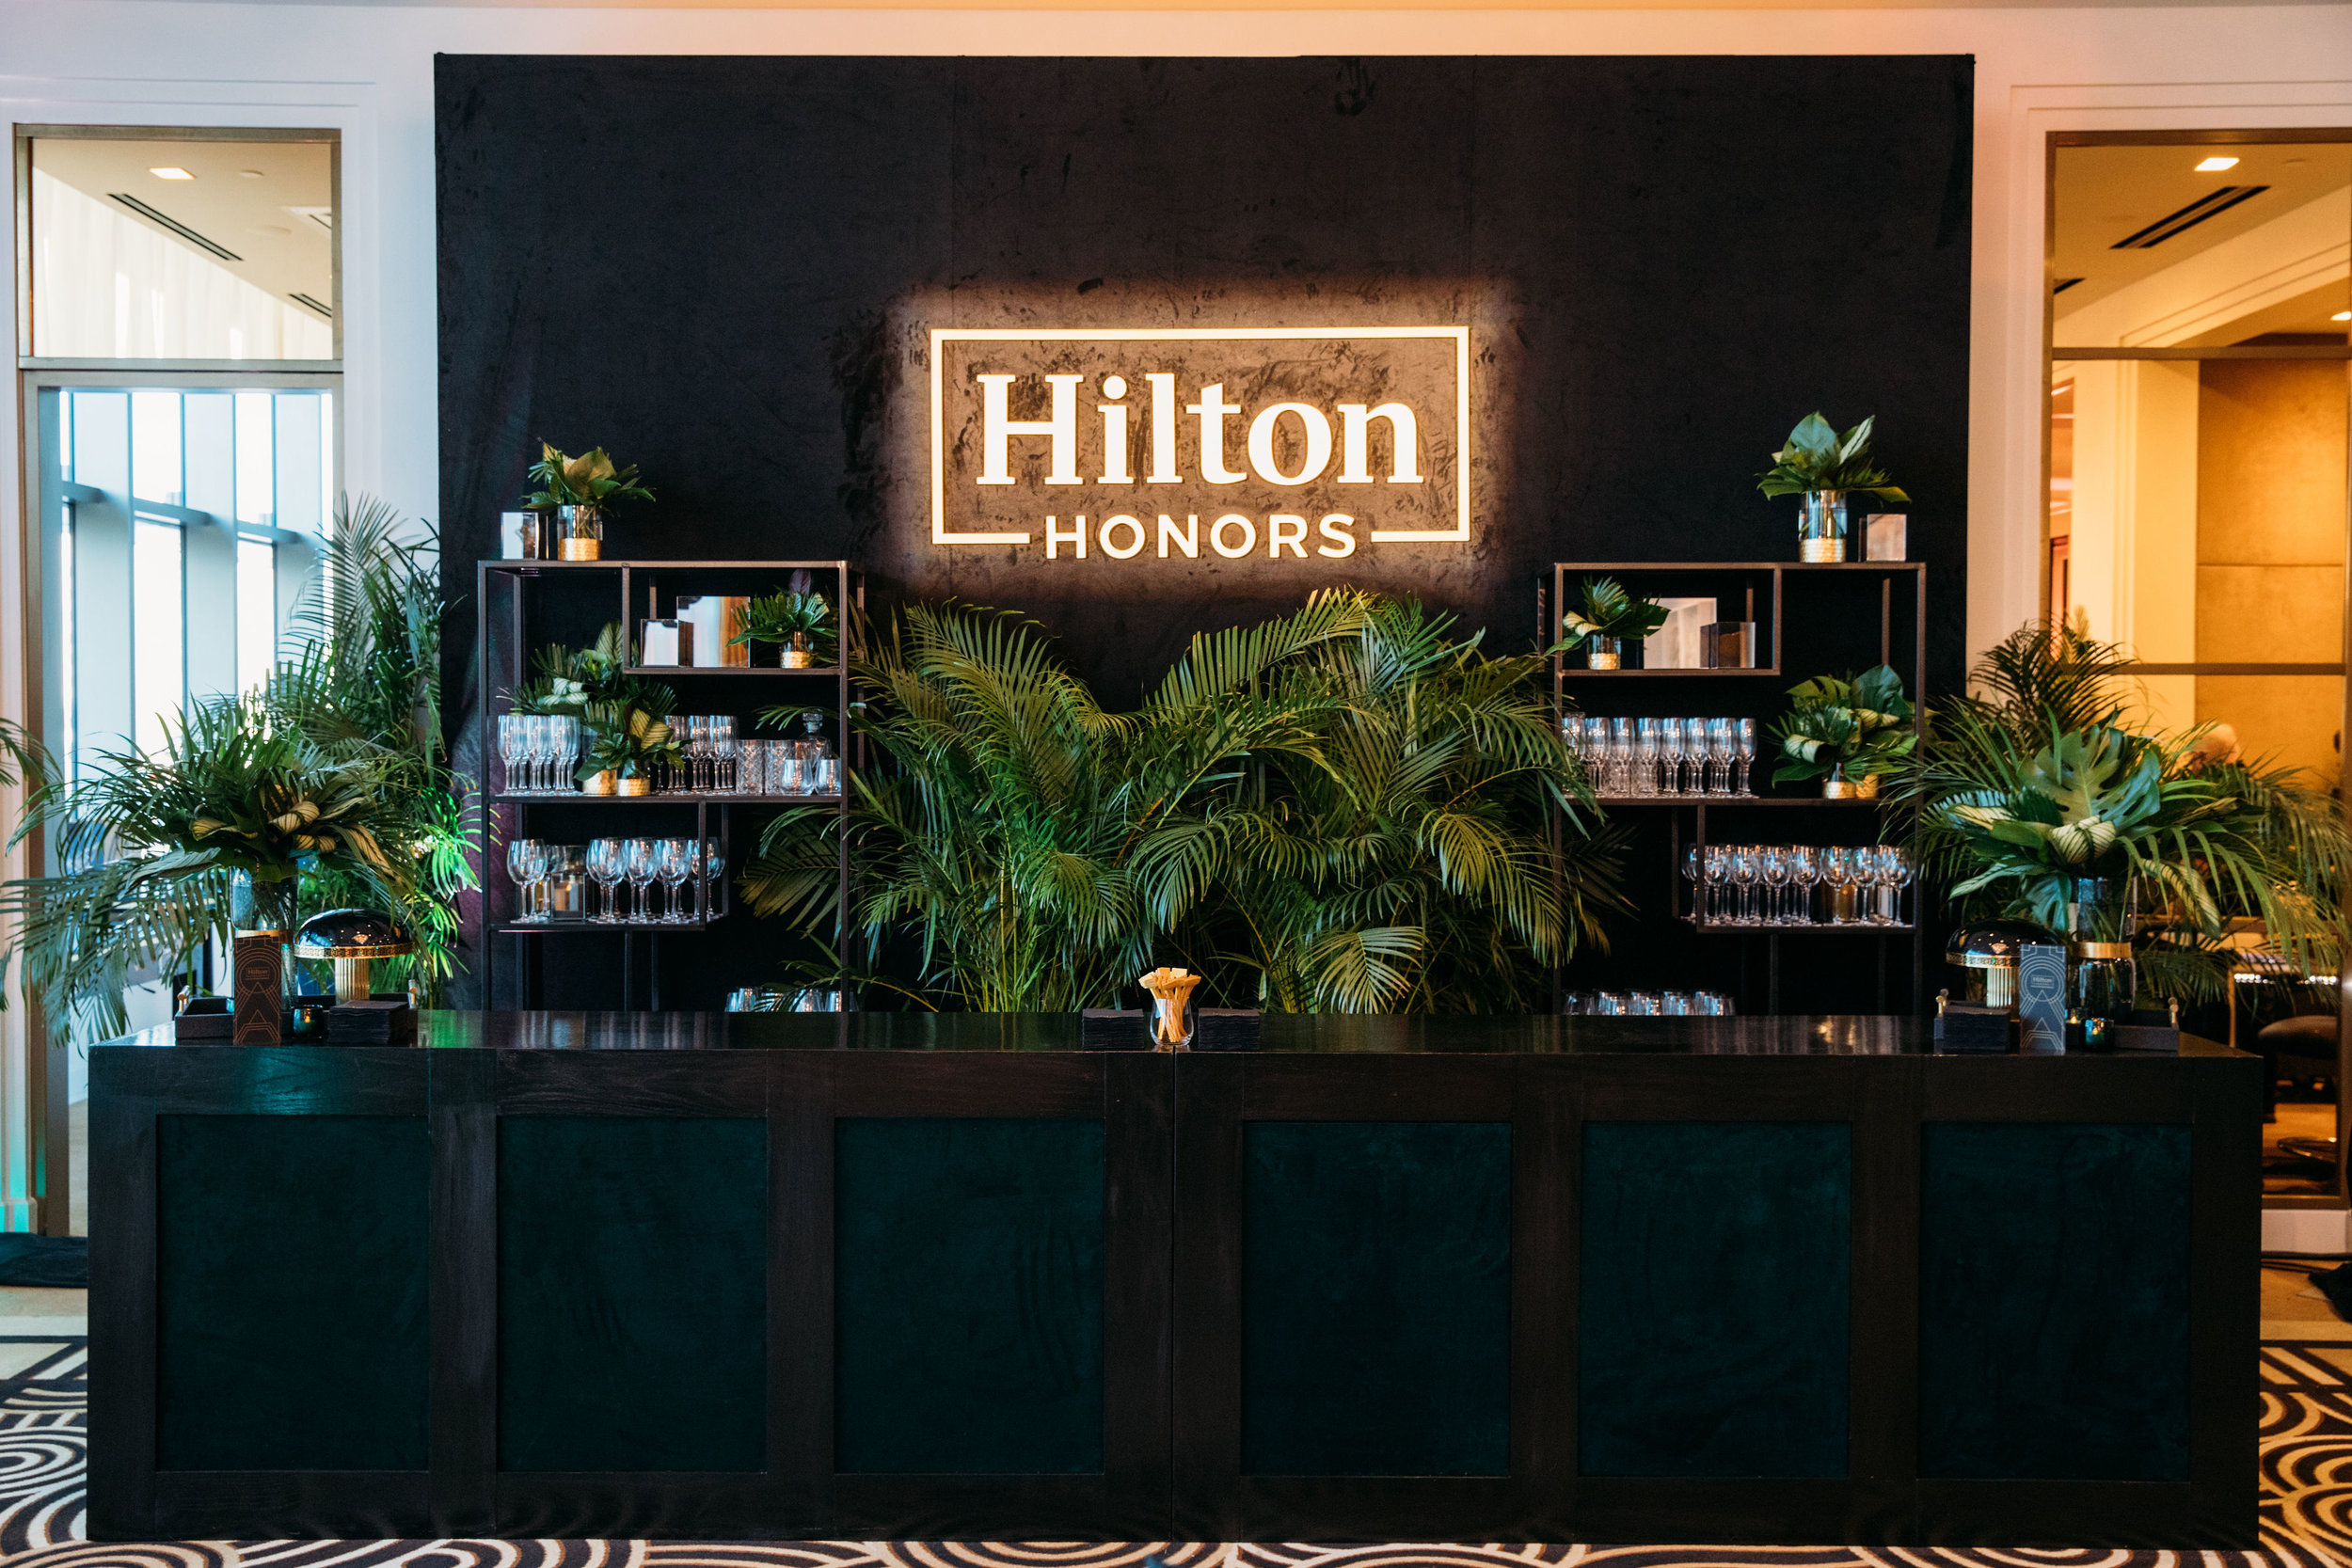 HiltonH_0040.jpg